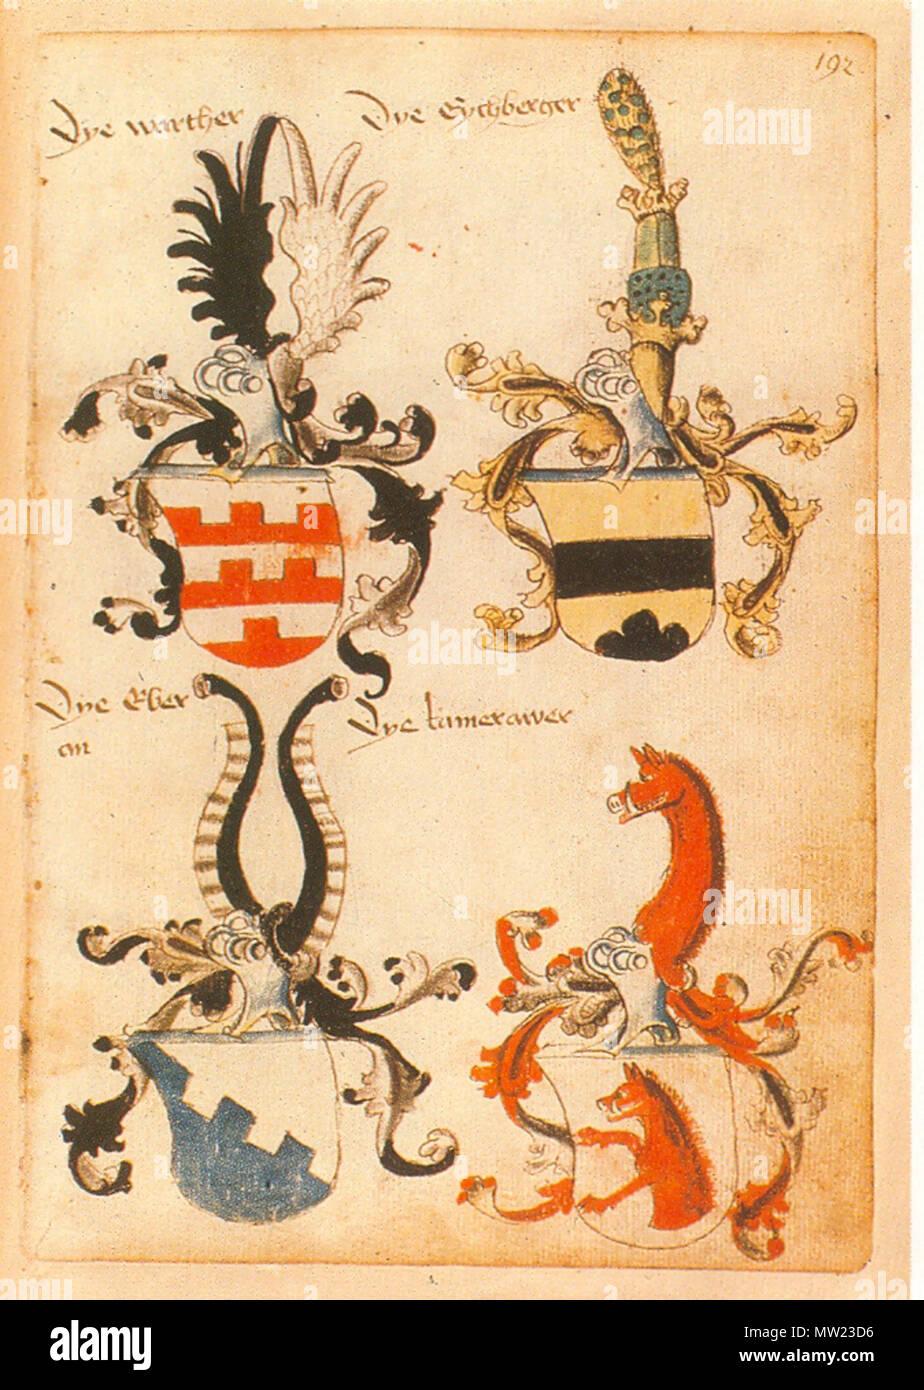 . Ingeram-Codex der ehemaligen Bibliothek Cotta Dye warther Dye Eychberger Dye Eber/an Dye tamerawer 668 Ingeram Codex 192 - Stock Image